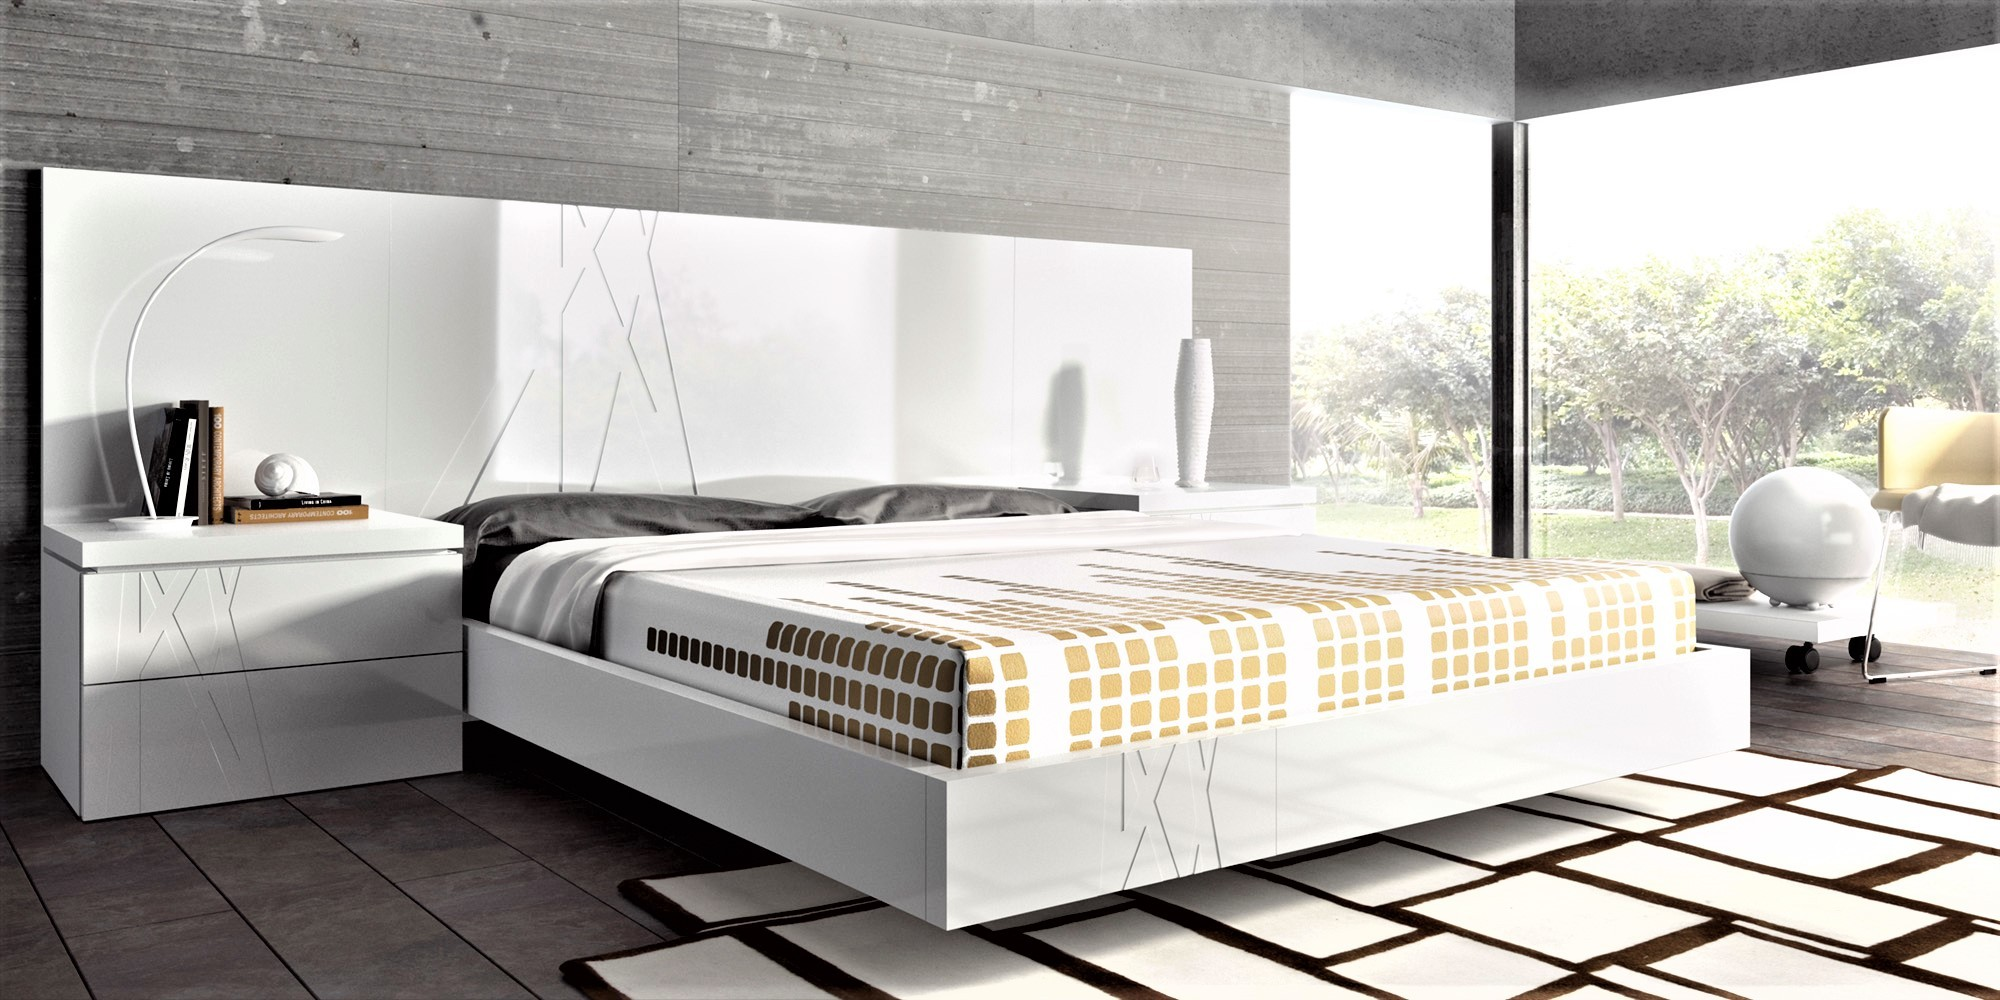 Guardia Gala Modern Bed In High Gloss Or Matt Lacquer